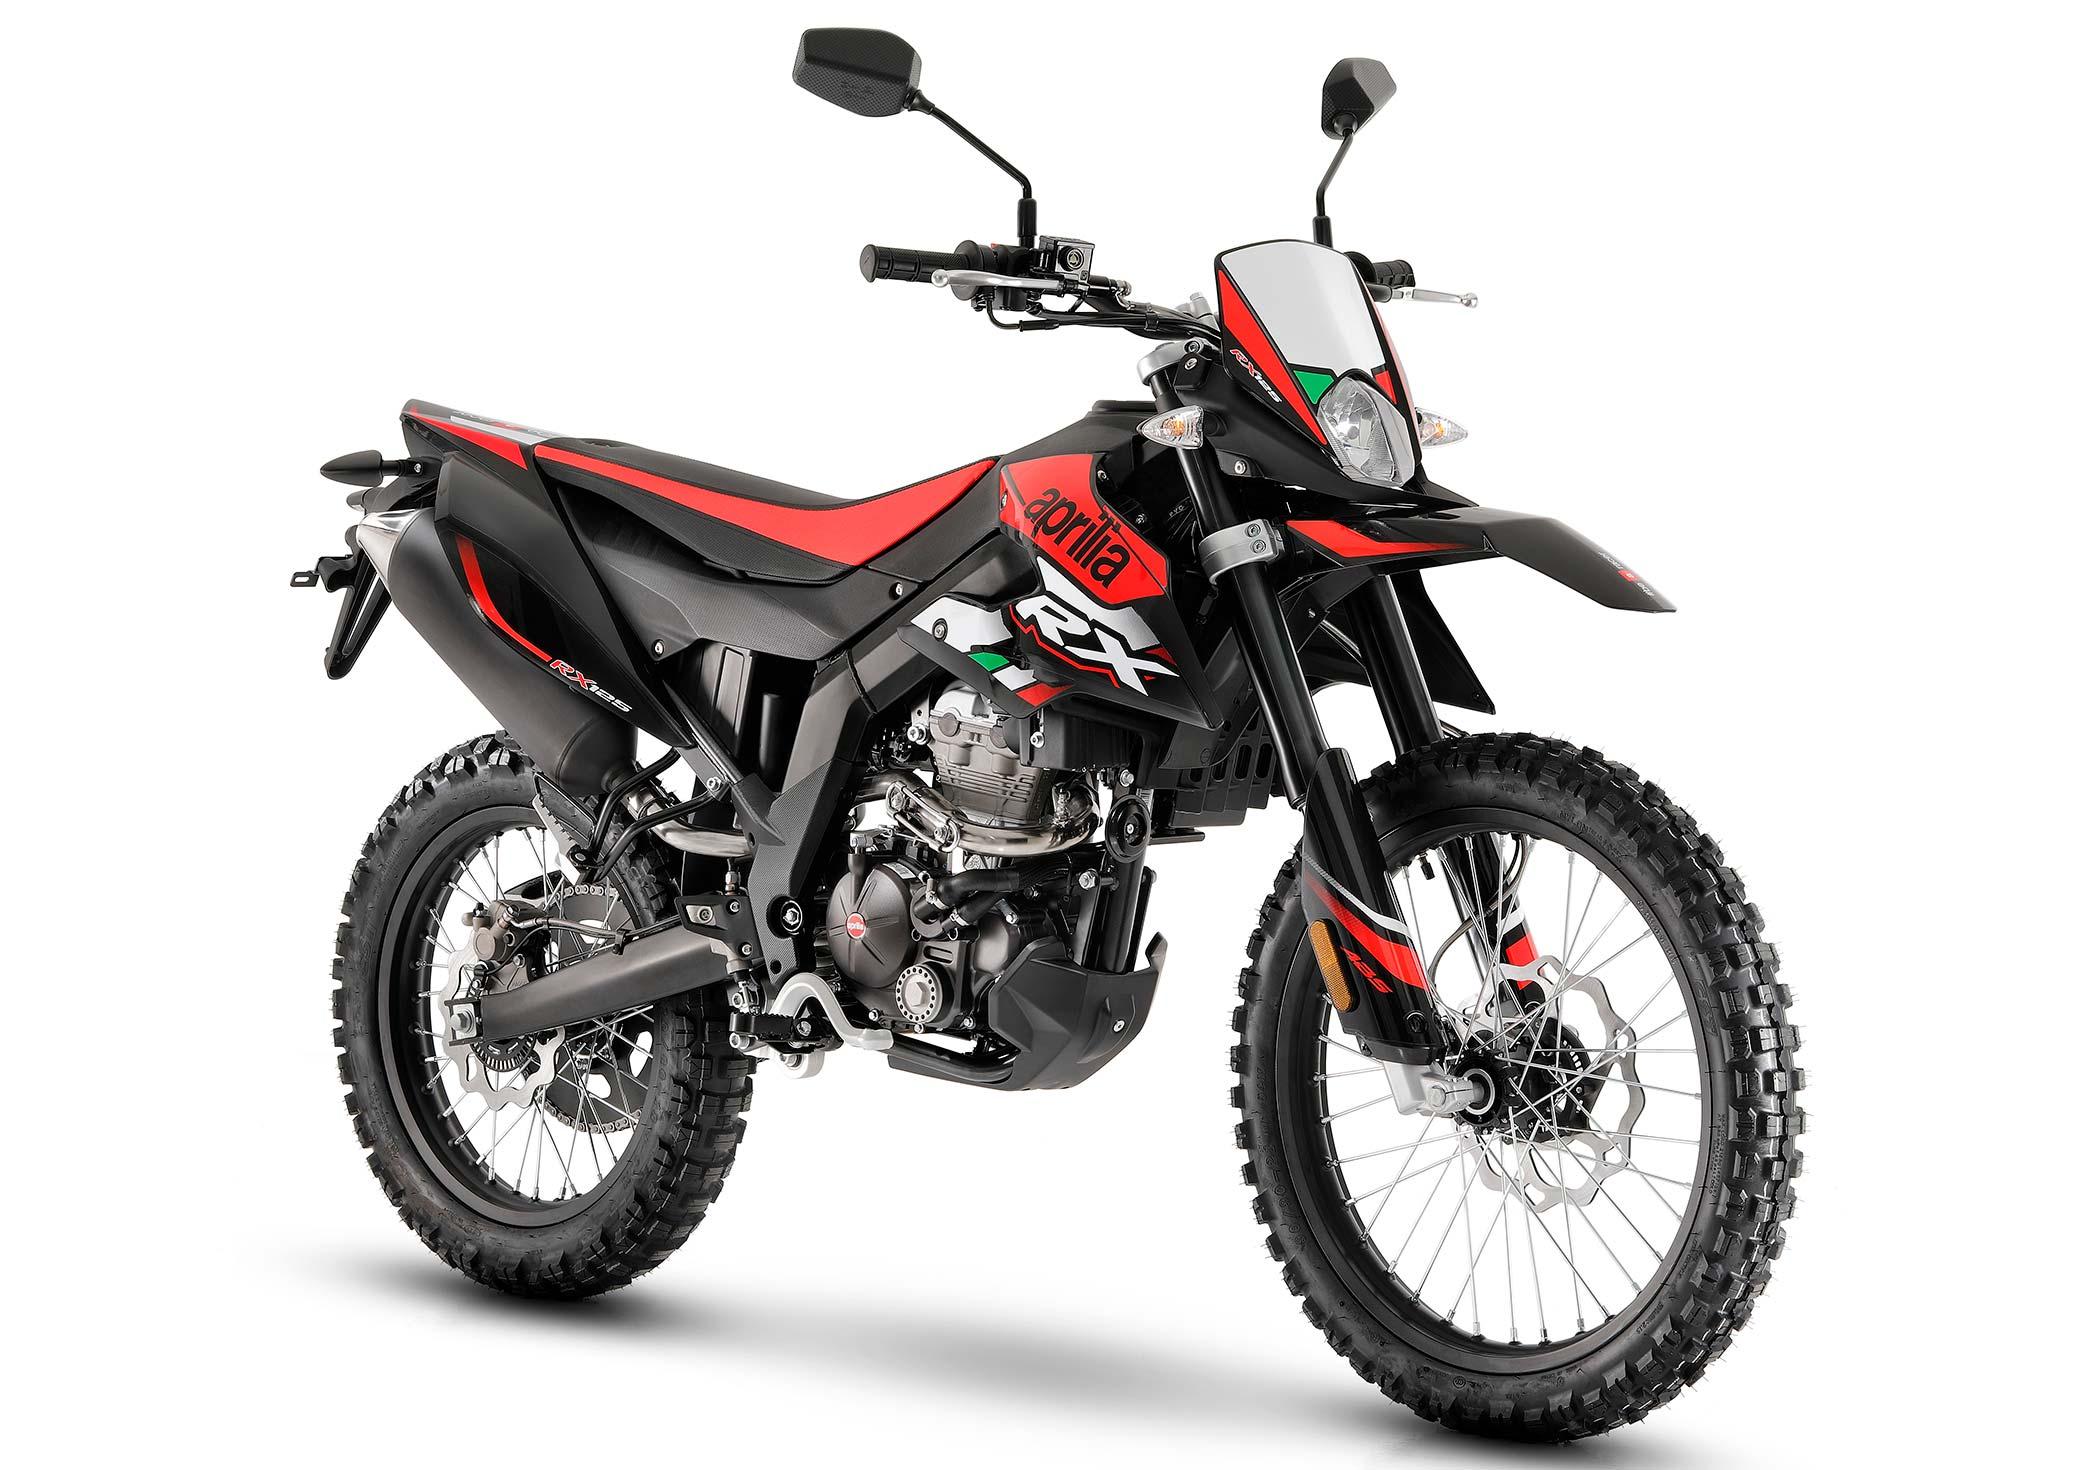 Aprilia RX 125 - Teasdale Motorcycles